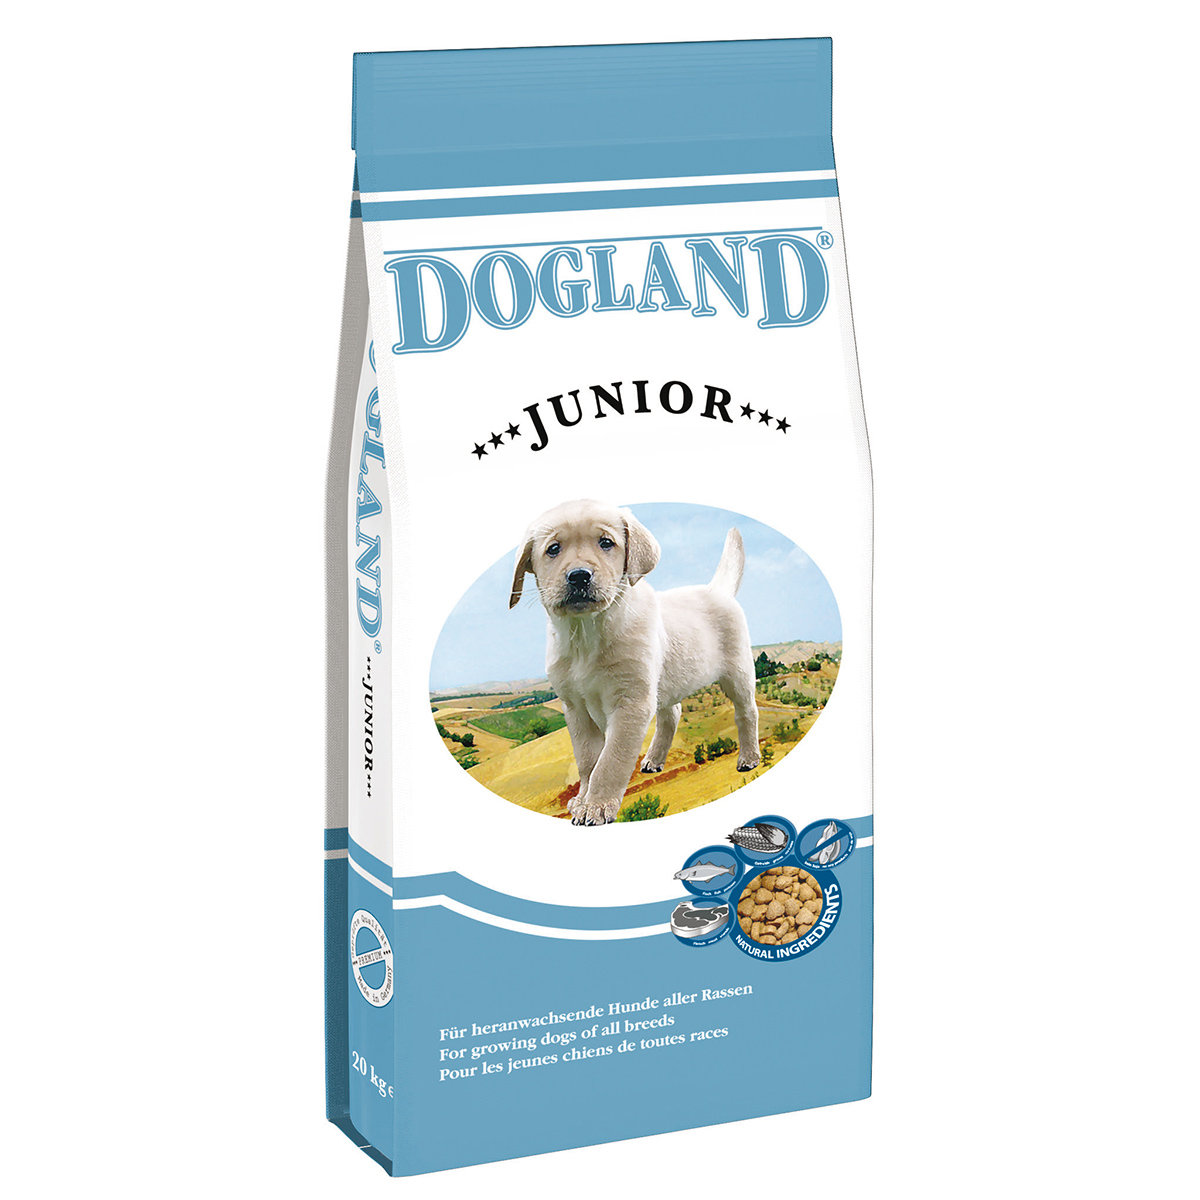 Dogland Dog Junior 15 kg imagine